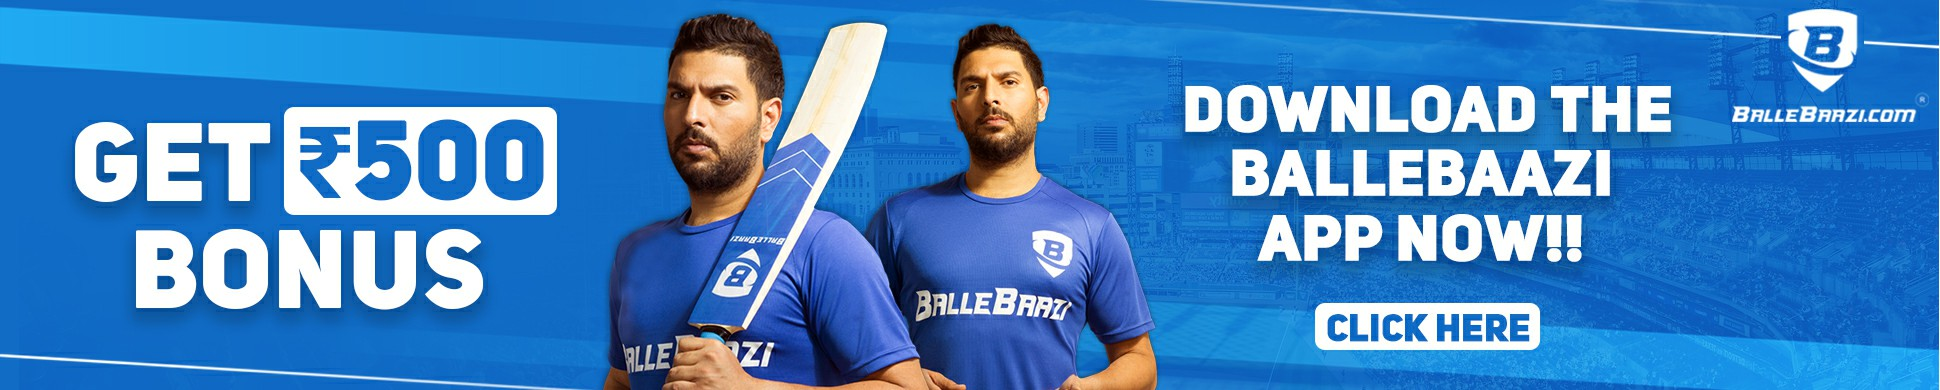 IND vs SA 1st ODI Dream11 Prediction